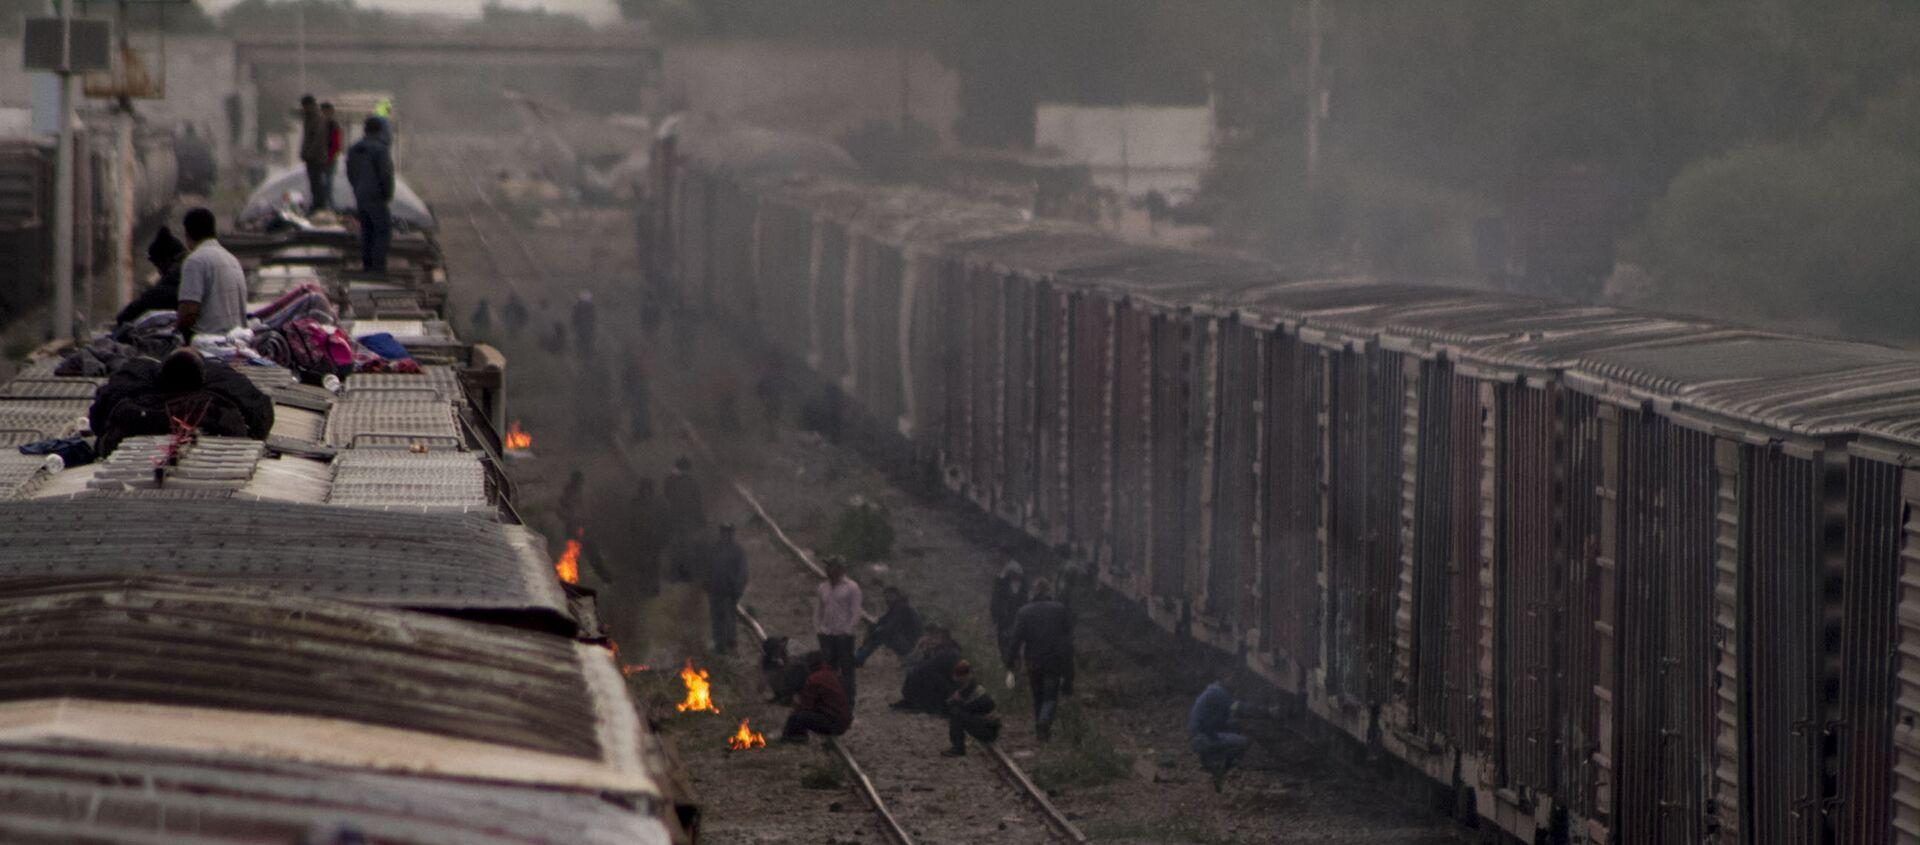 Migrantes esperan la salida de La Bestia en México - Sputnik Mundo, 1920, 07.08.2018